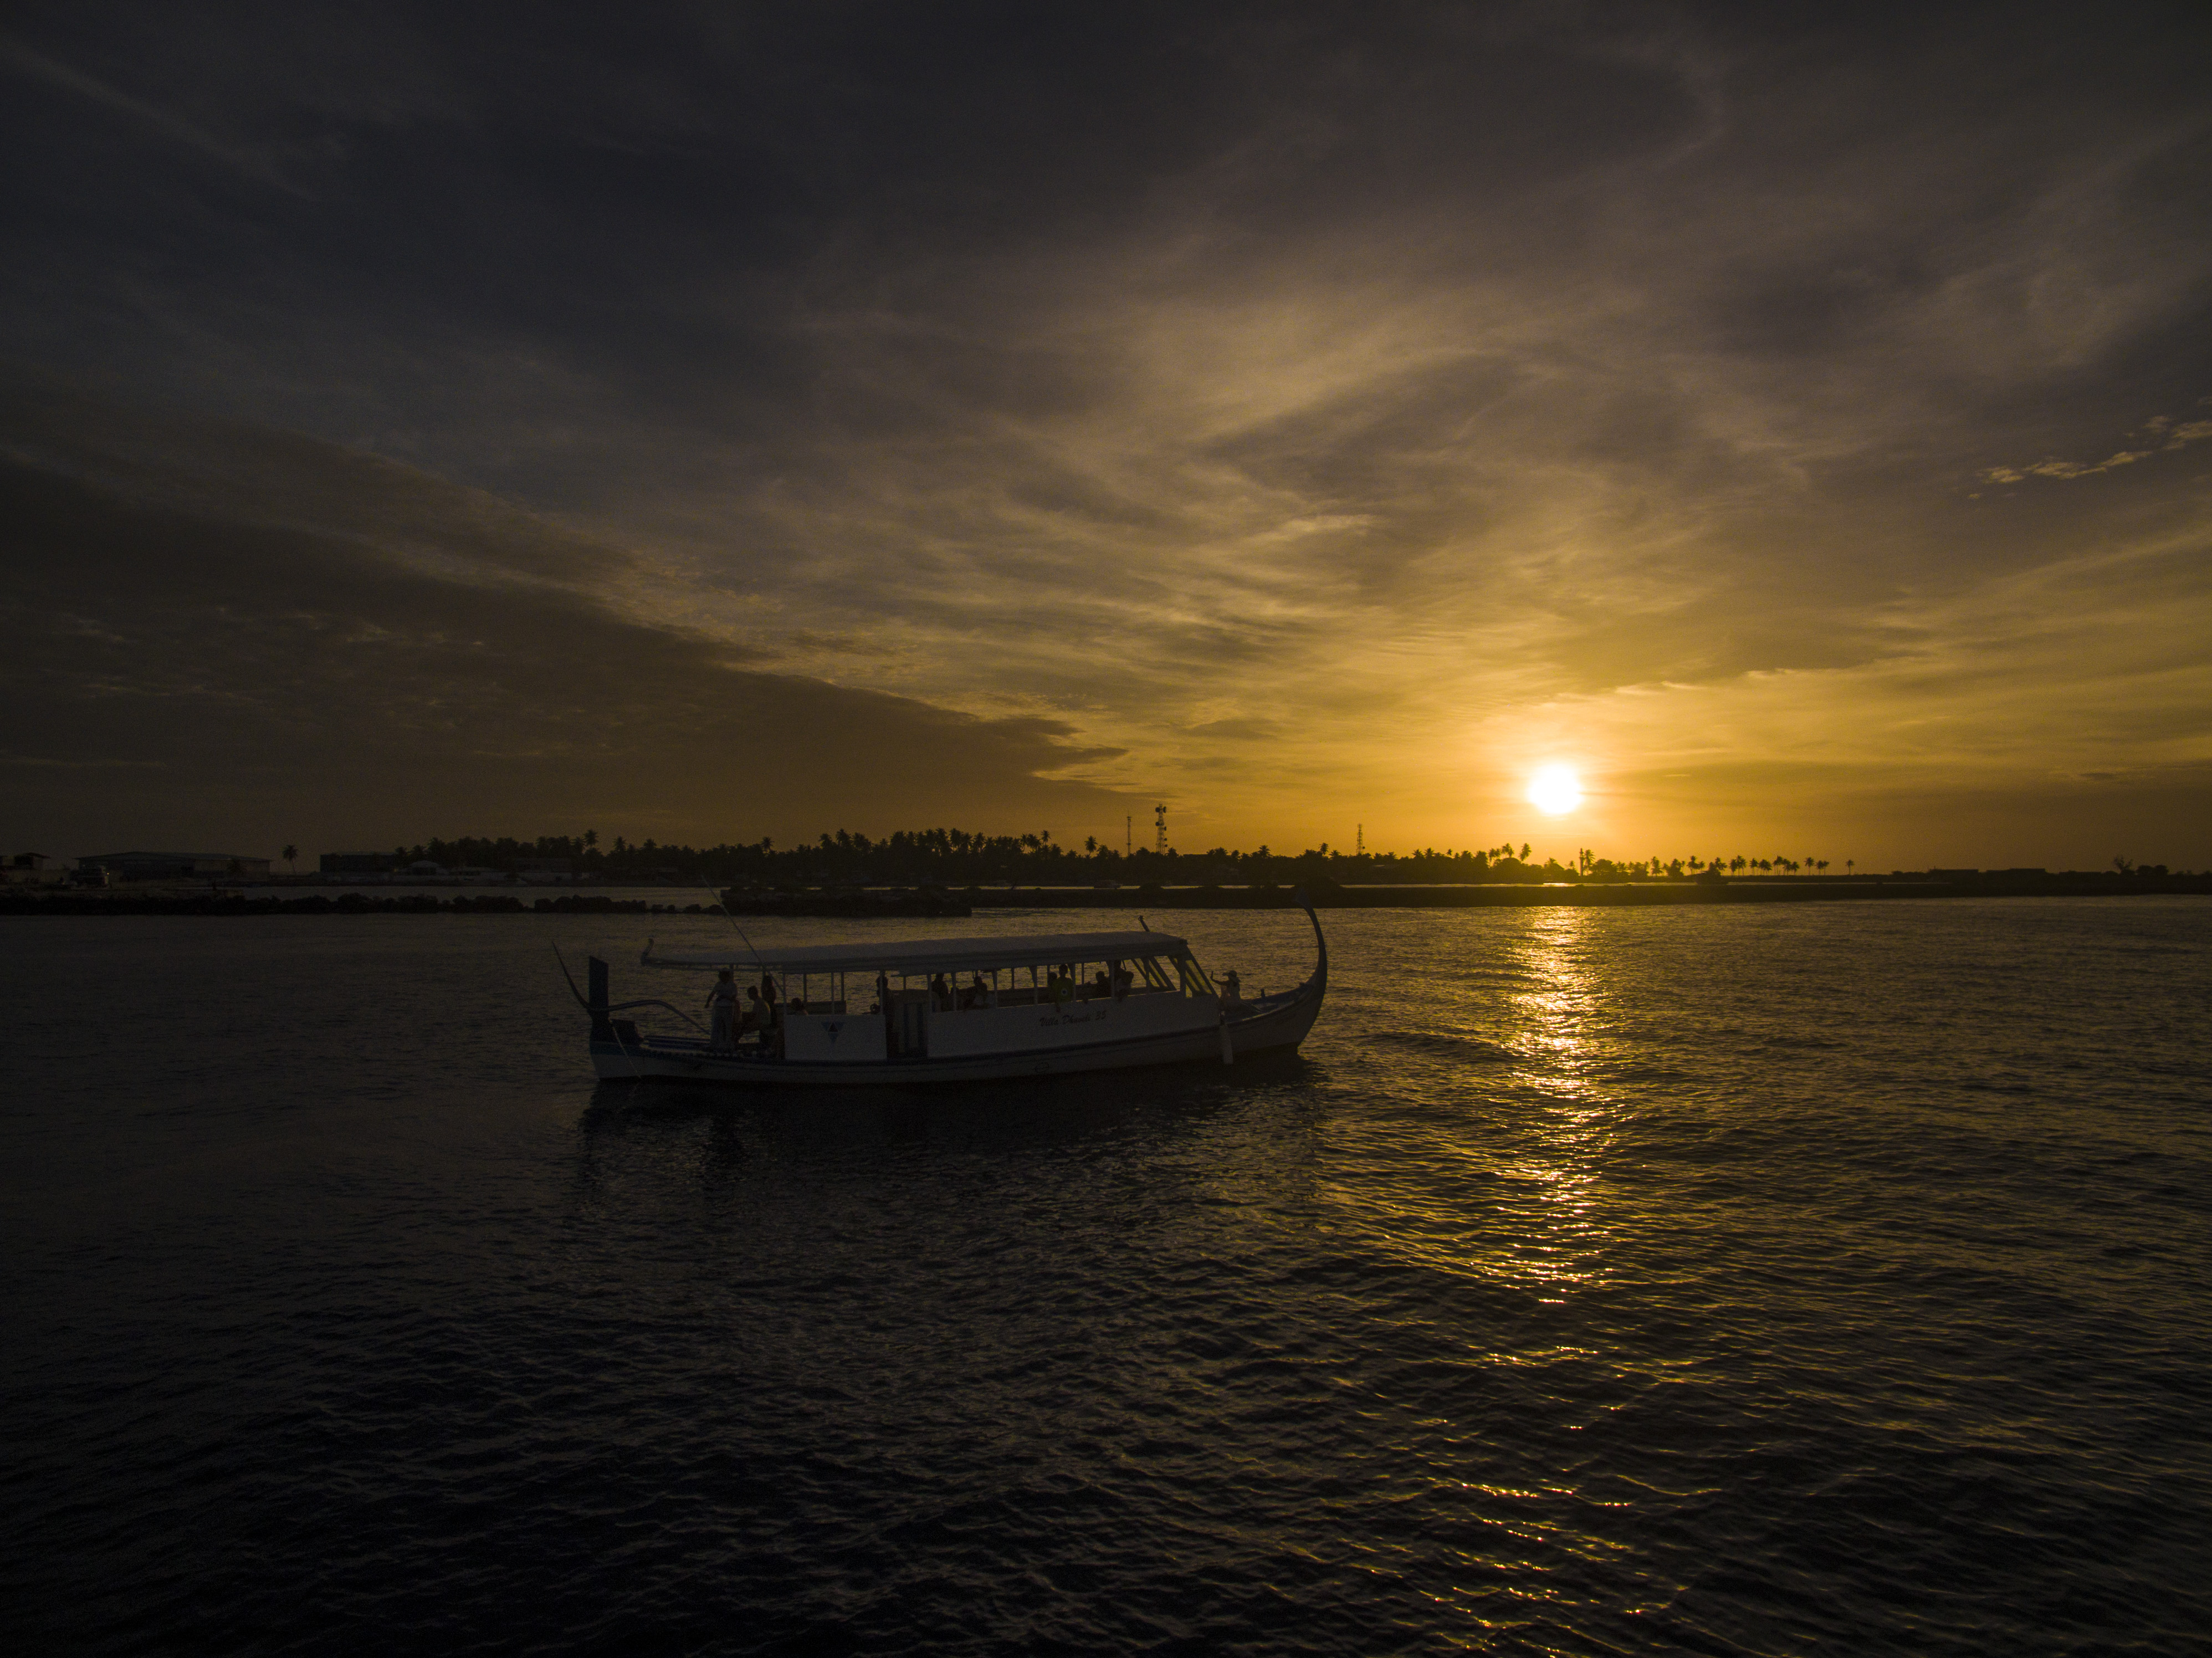 Lacabana Maldives  A Dh Maamigili Island (3)